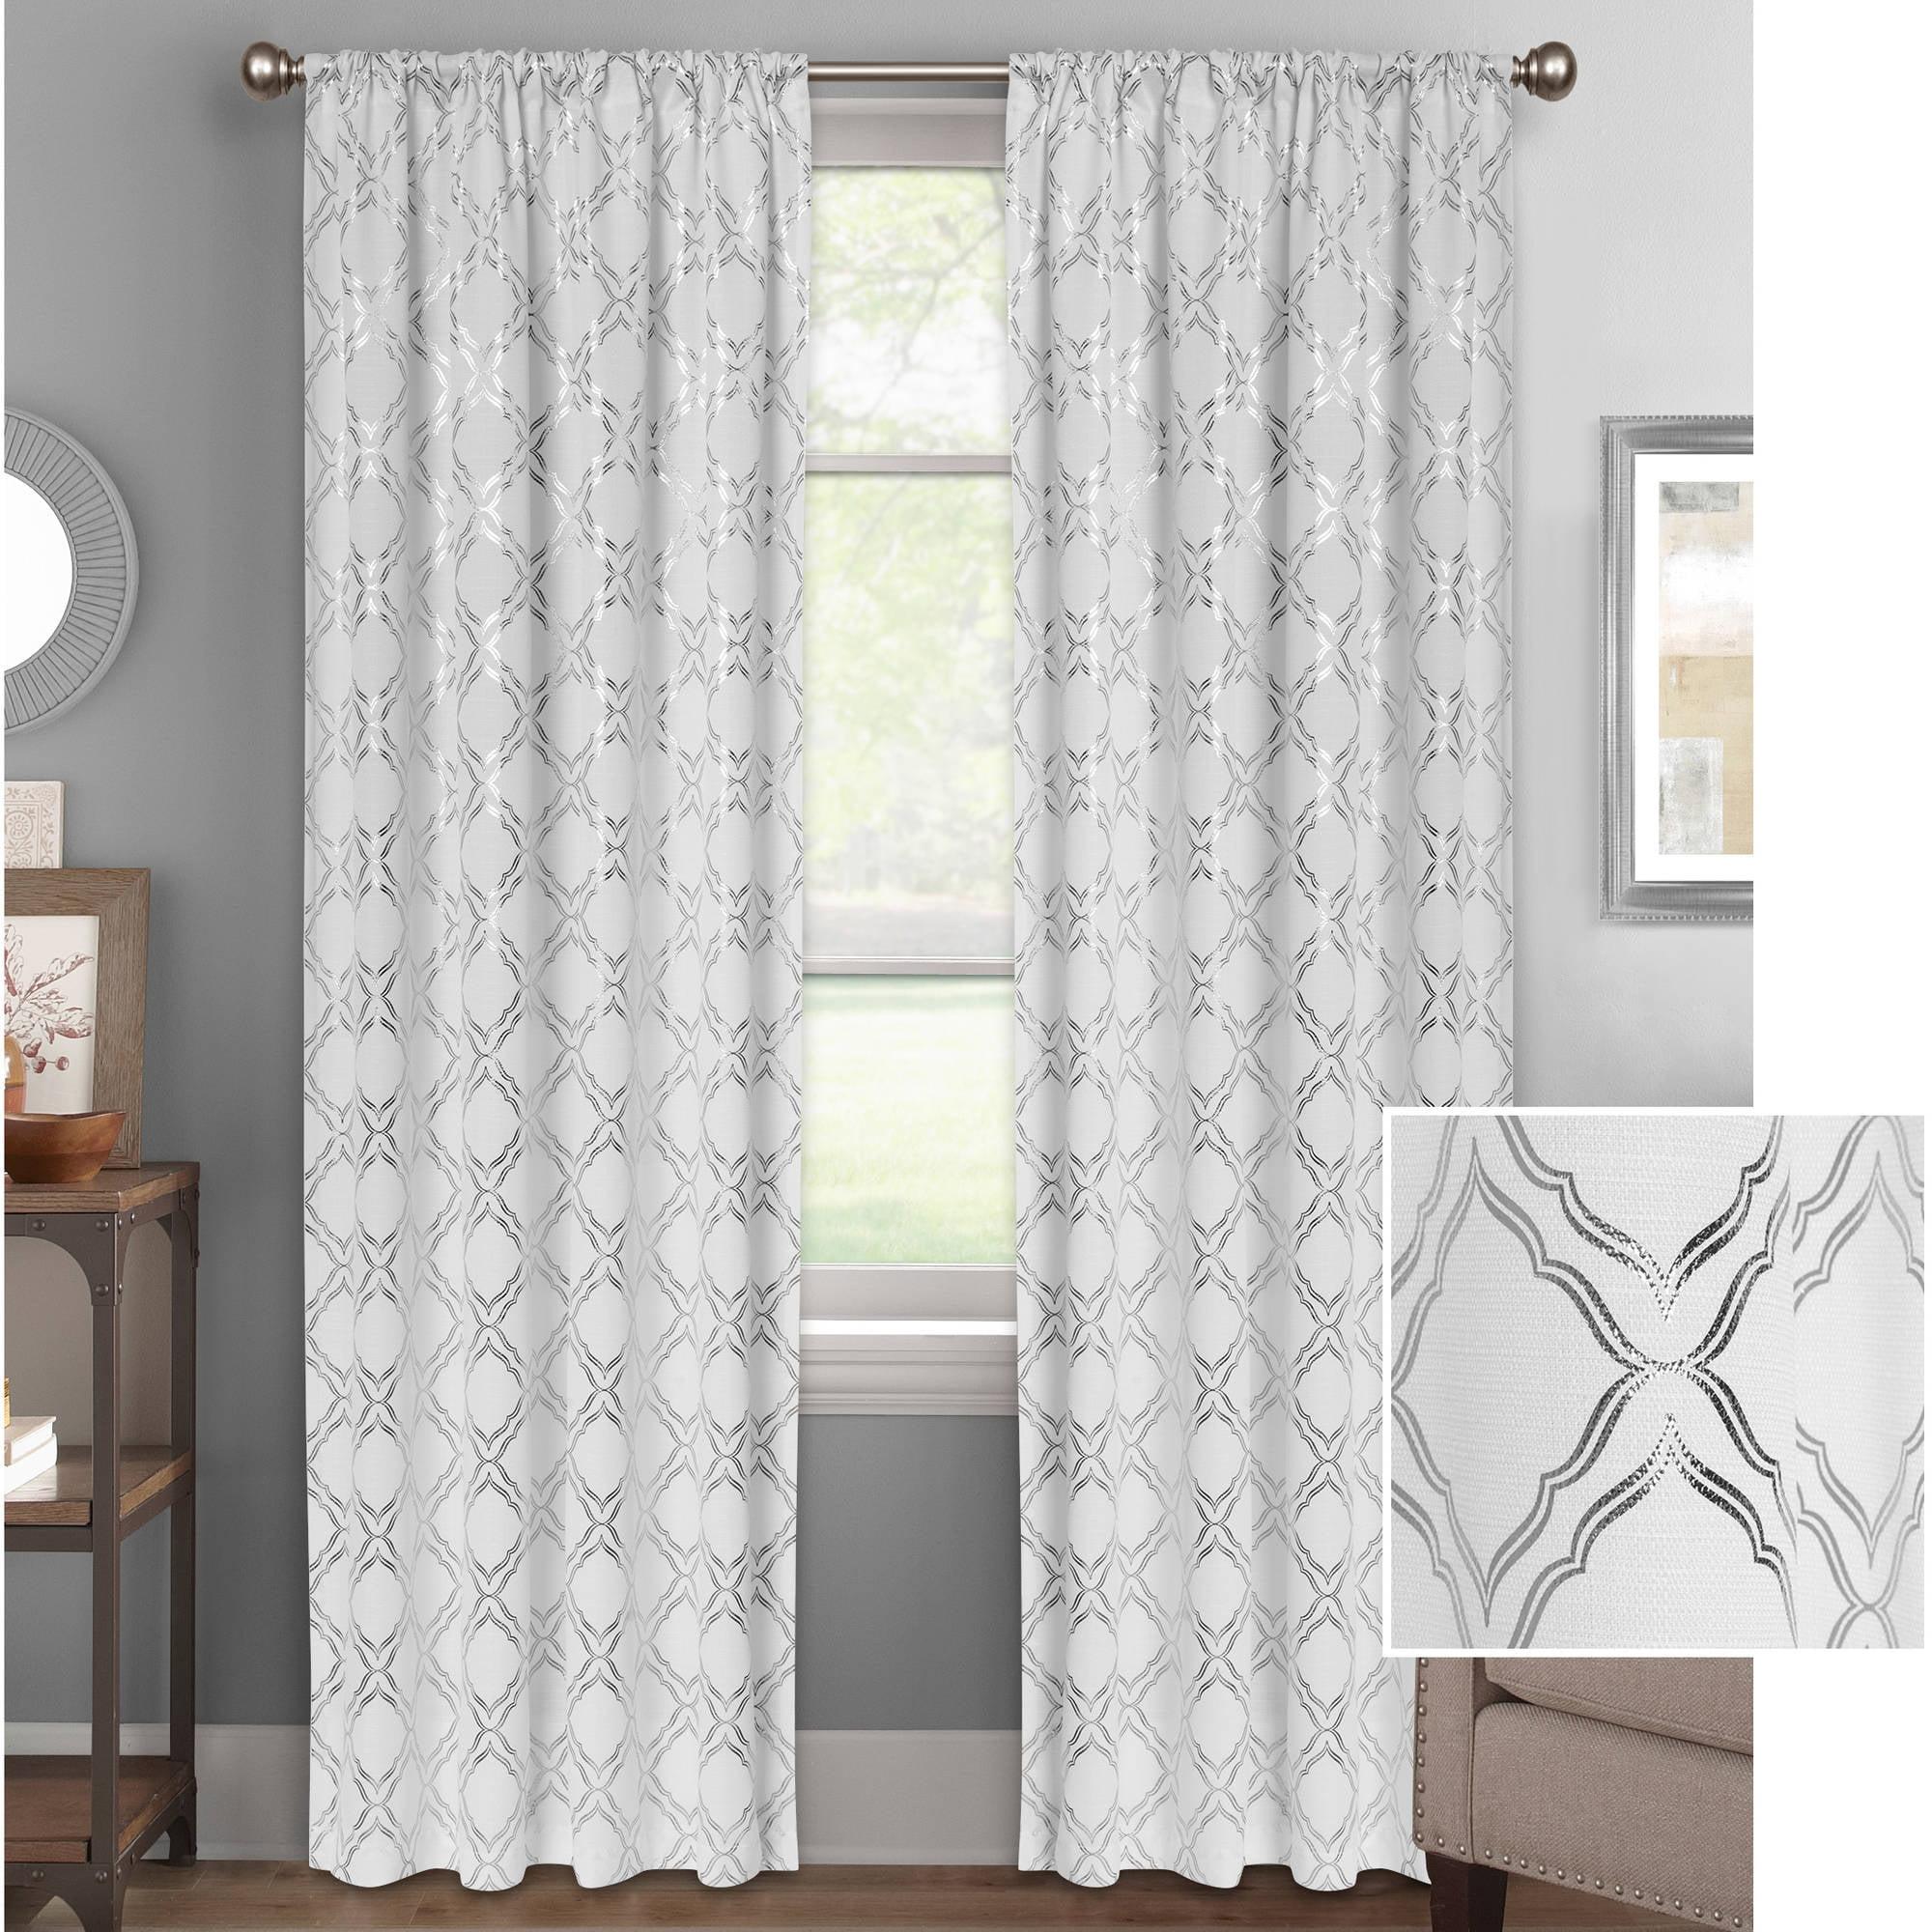 Better Homes and Gardens Metallic Foil Trellis Curtain Panel ...